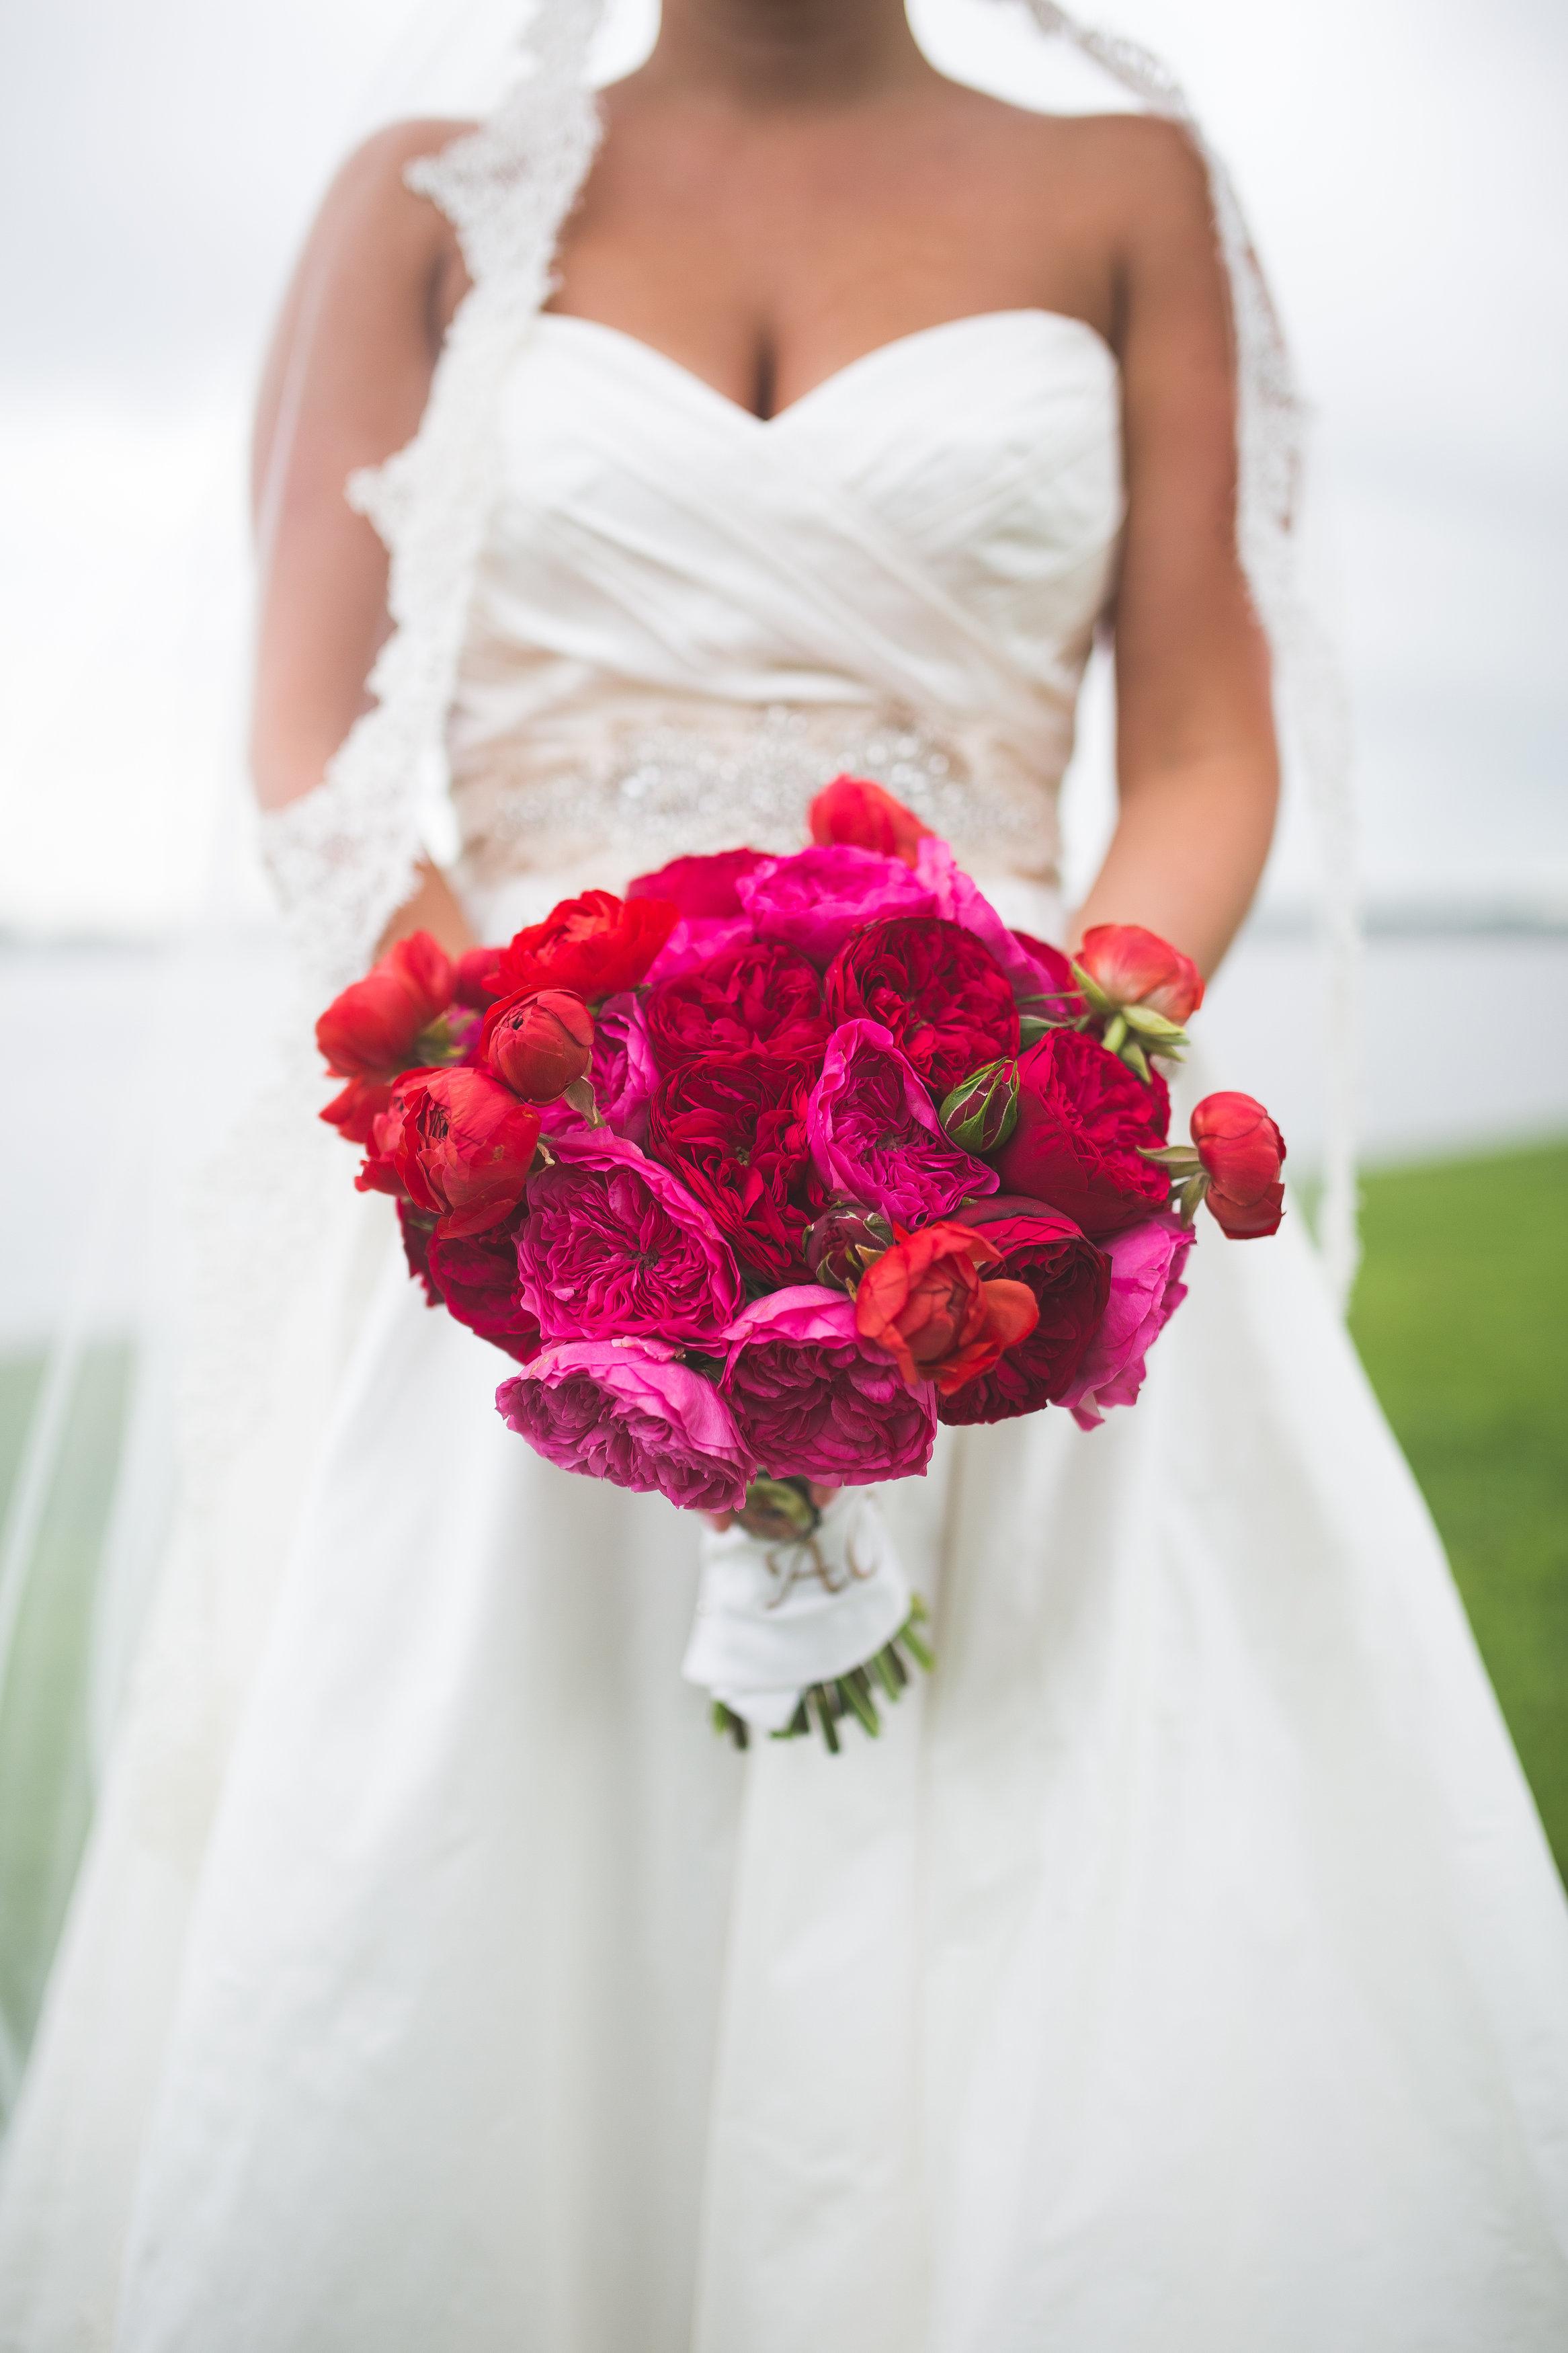 Island House wedding by Jenna Marie Photogrpahy